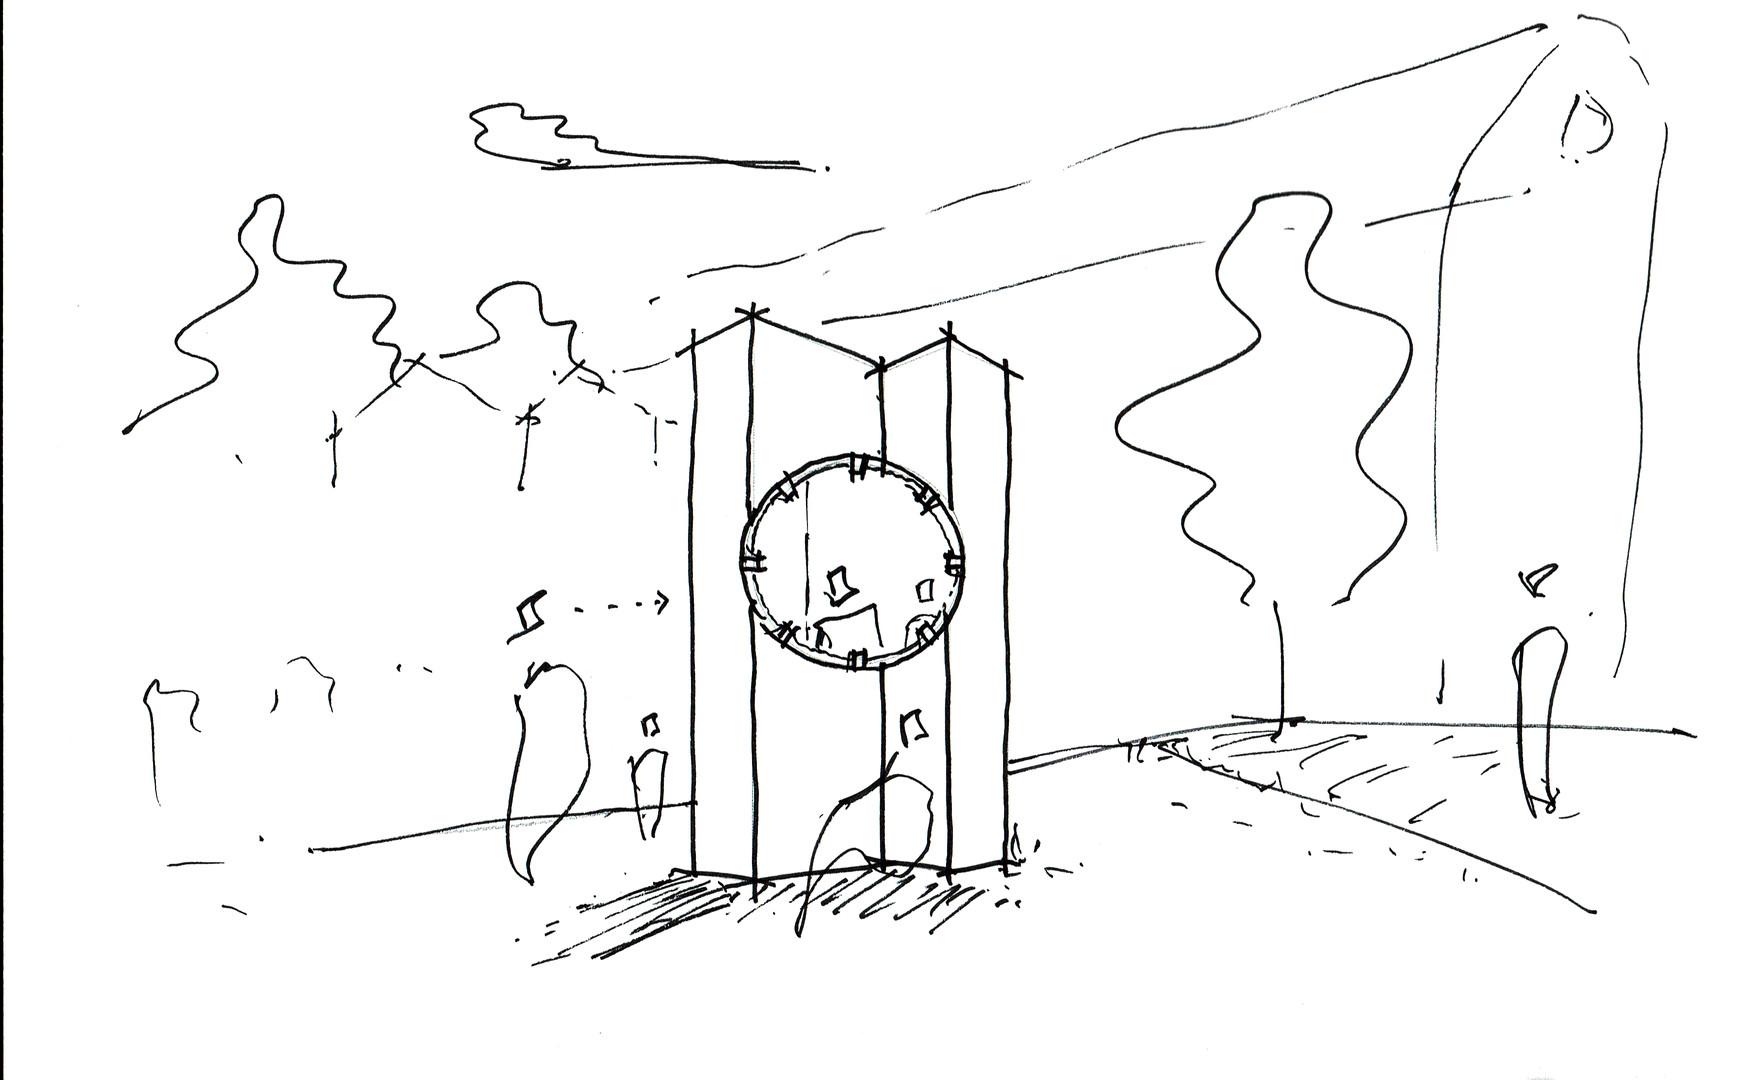 CDW Time piece sketch 180510 rev01.jpg